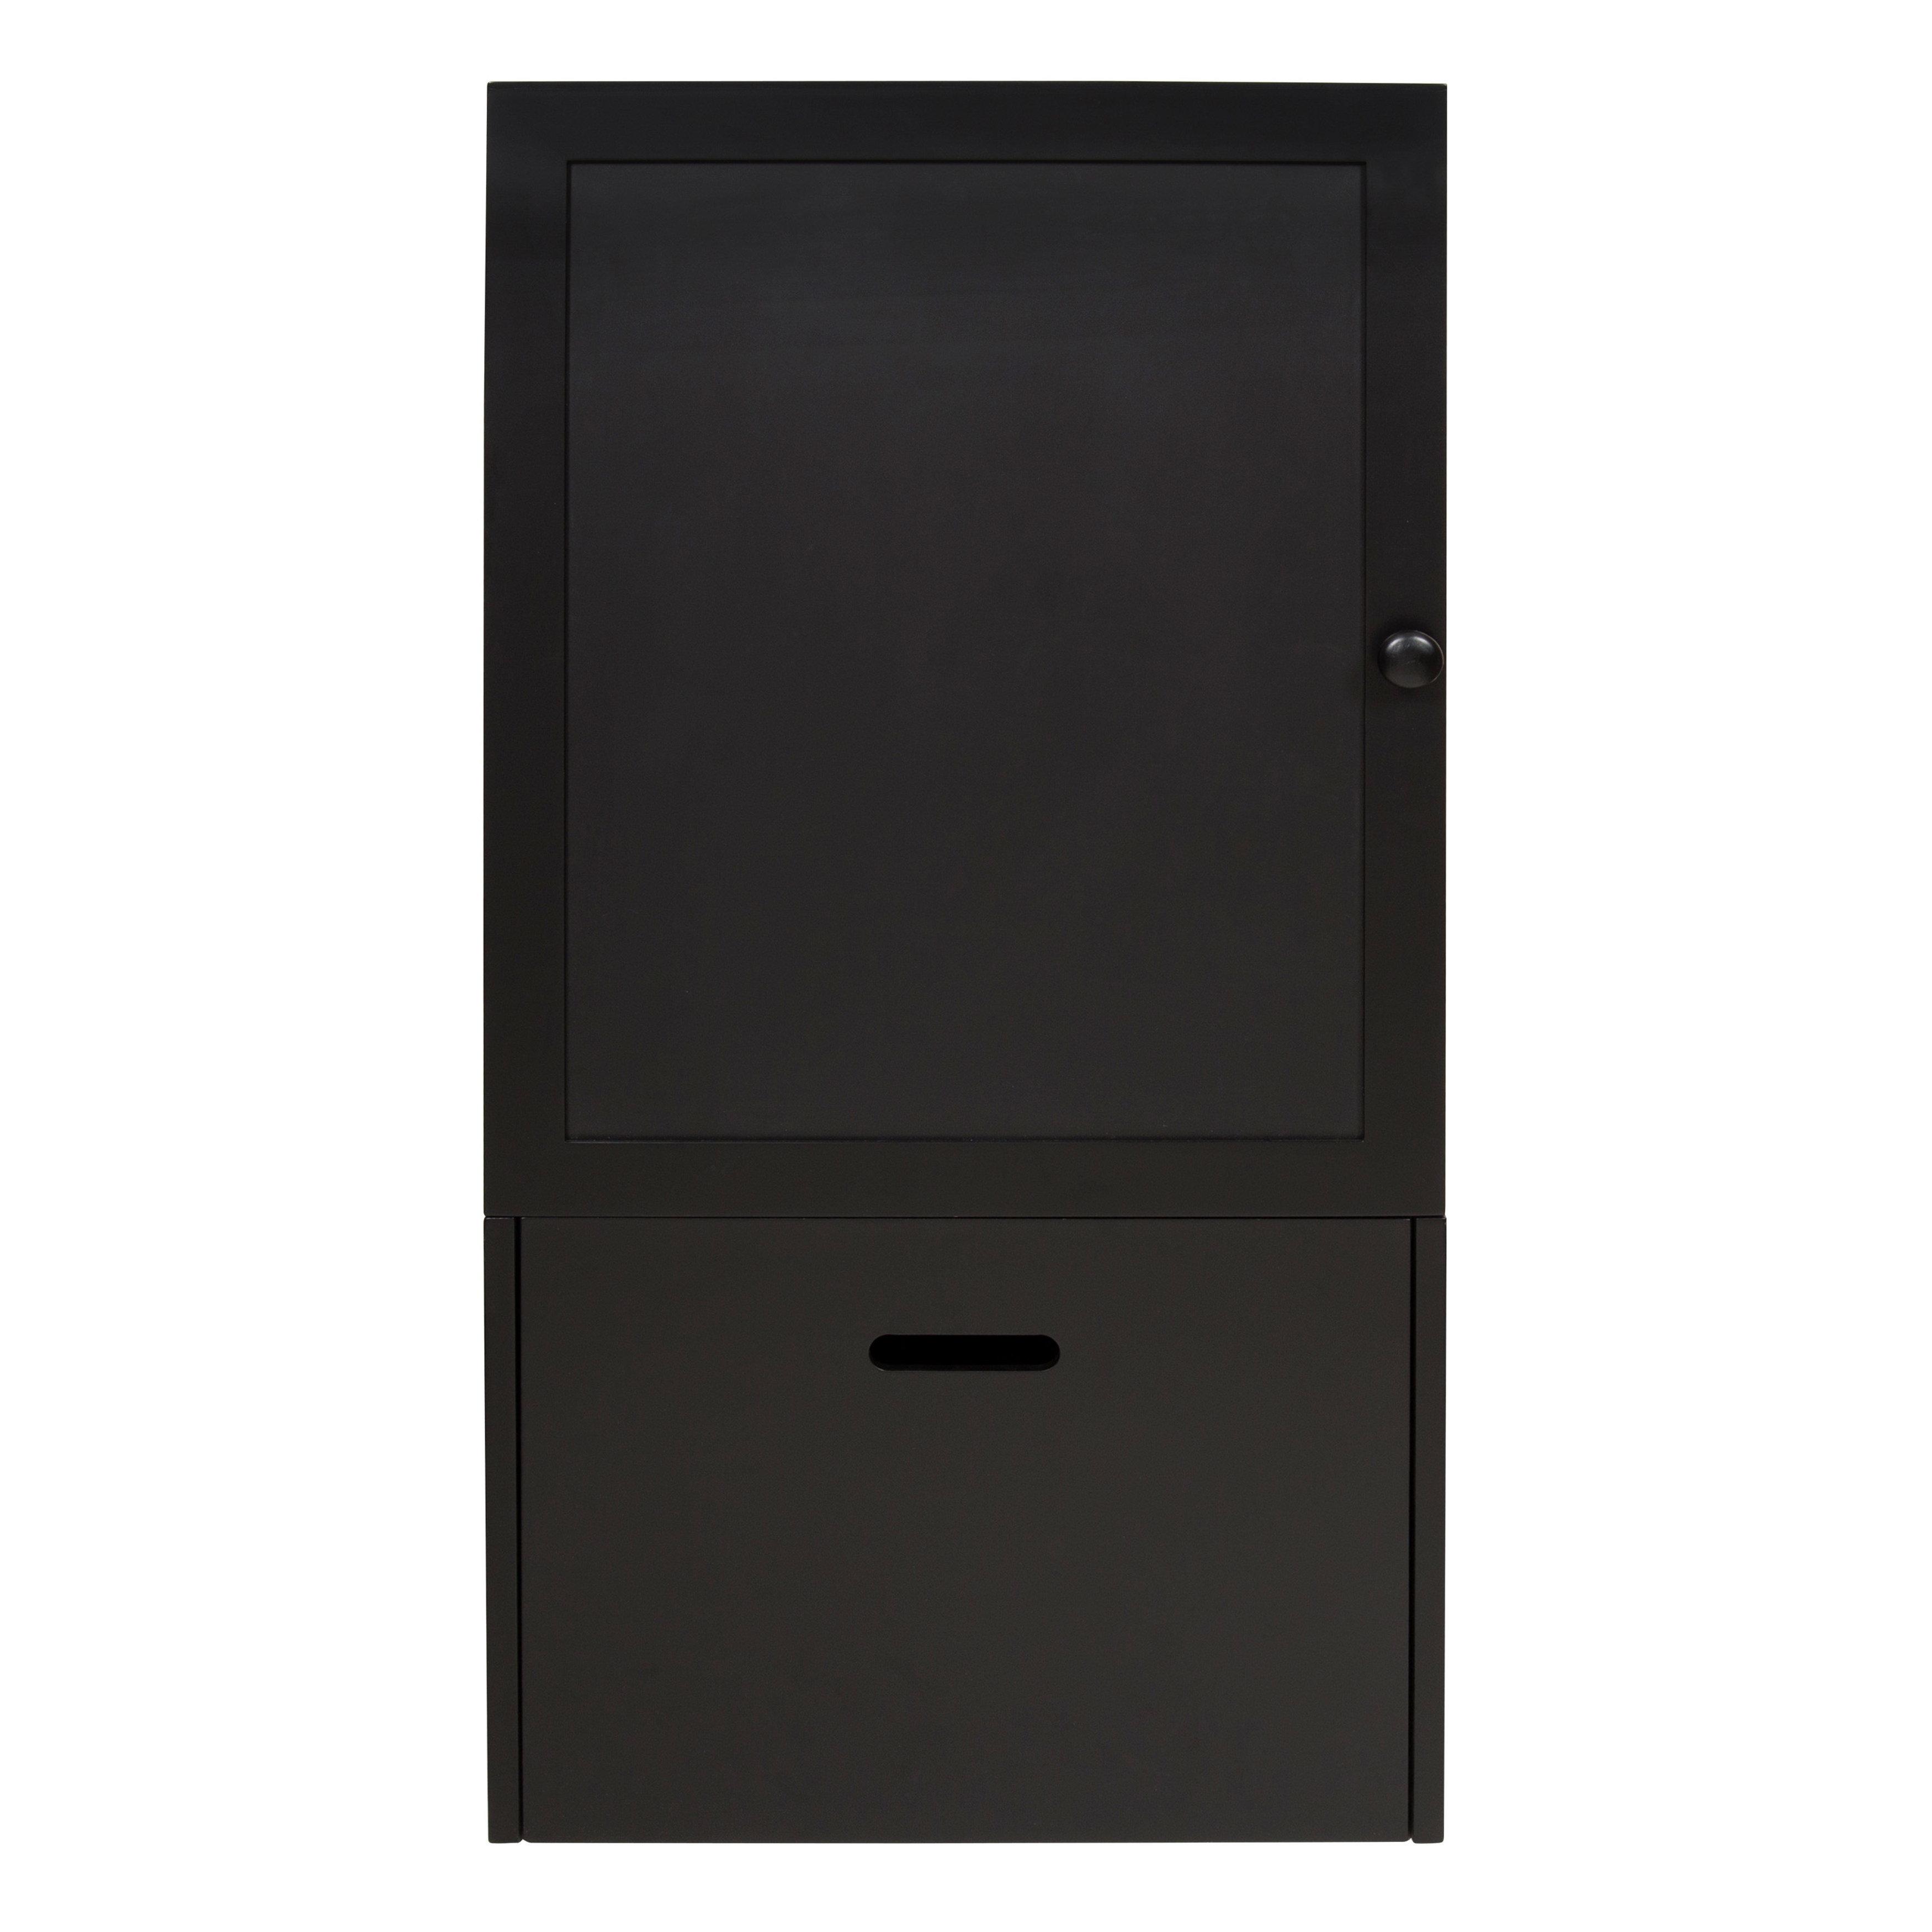 Gracie Oaks Zonia Storage Cabinet Wall Function Organizer